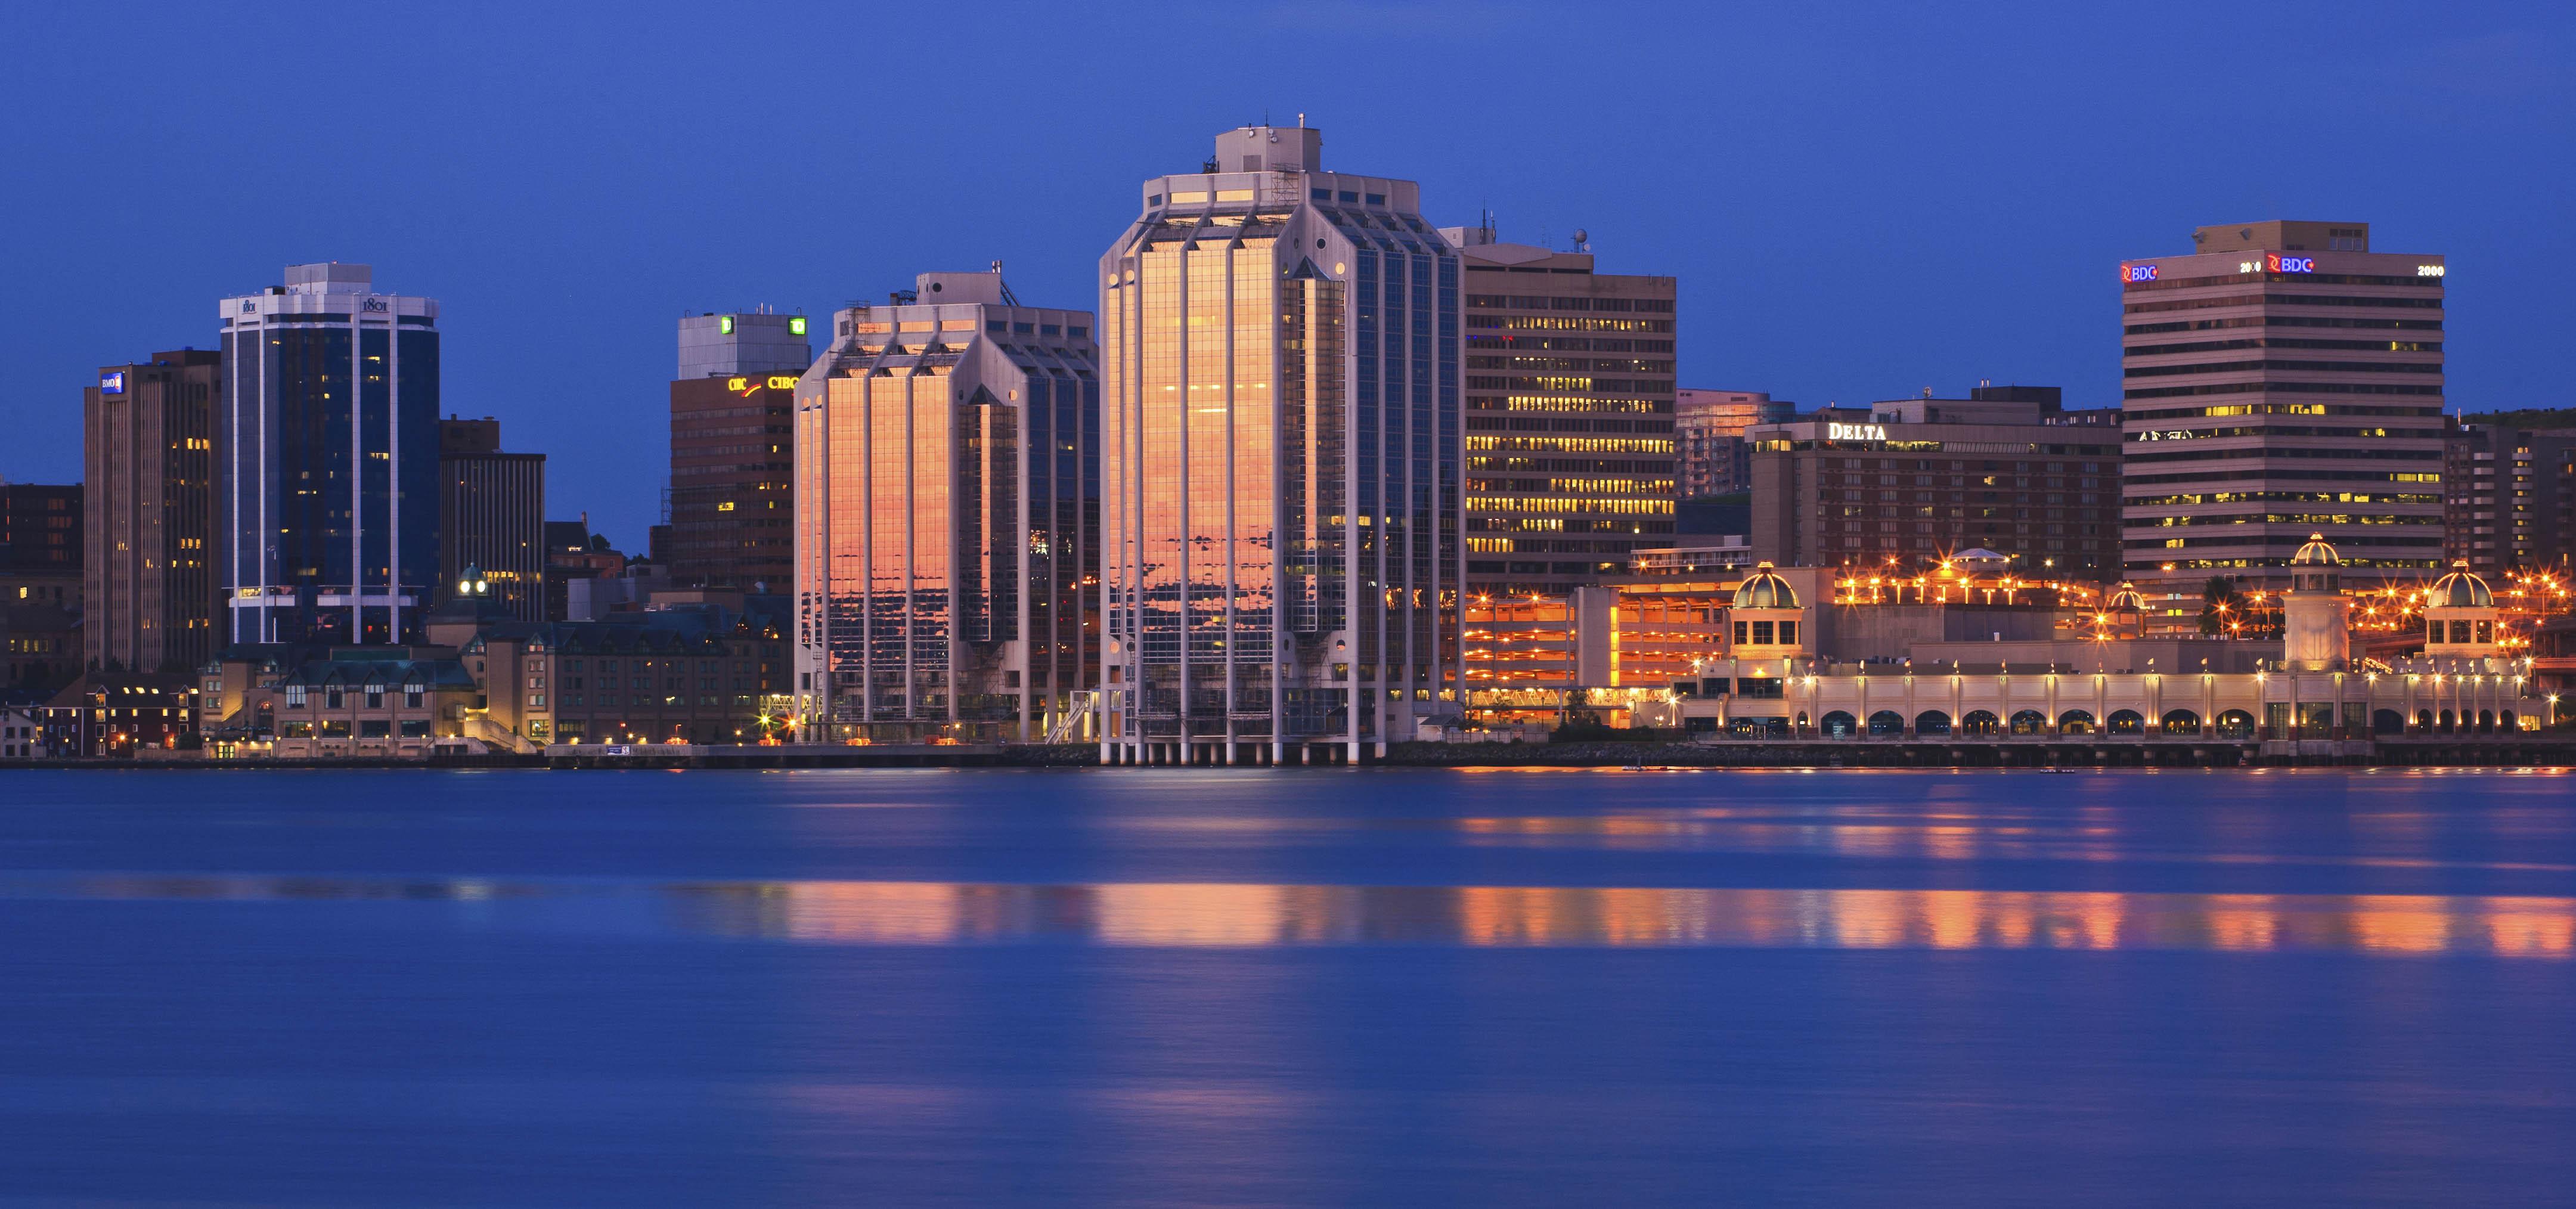 SEO Halifax - Search Engine Optimization Services